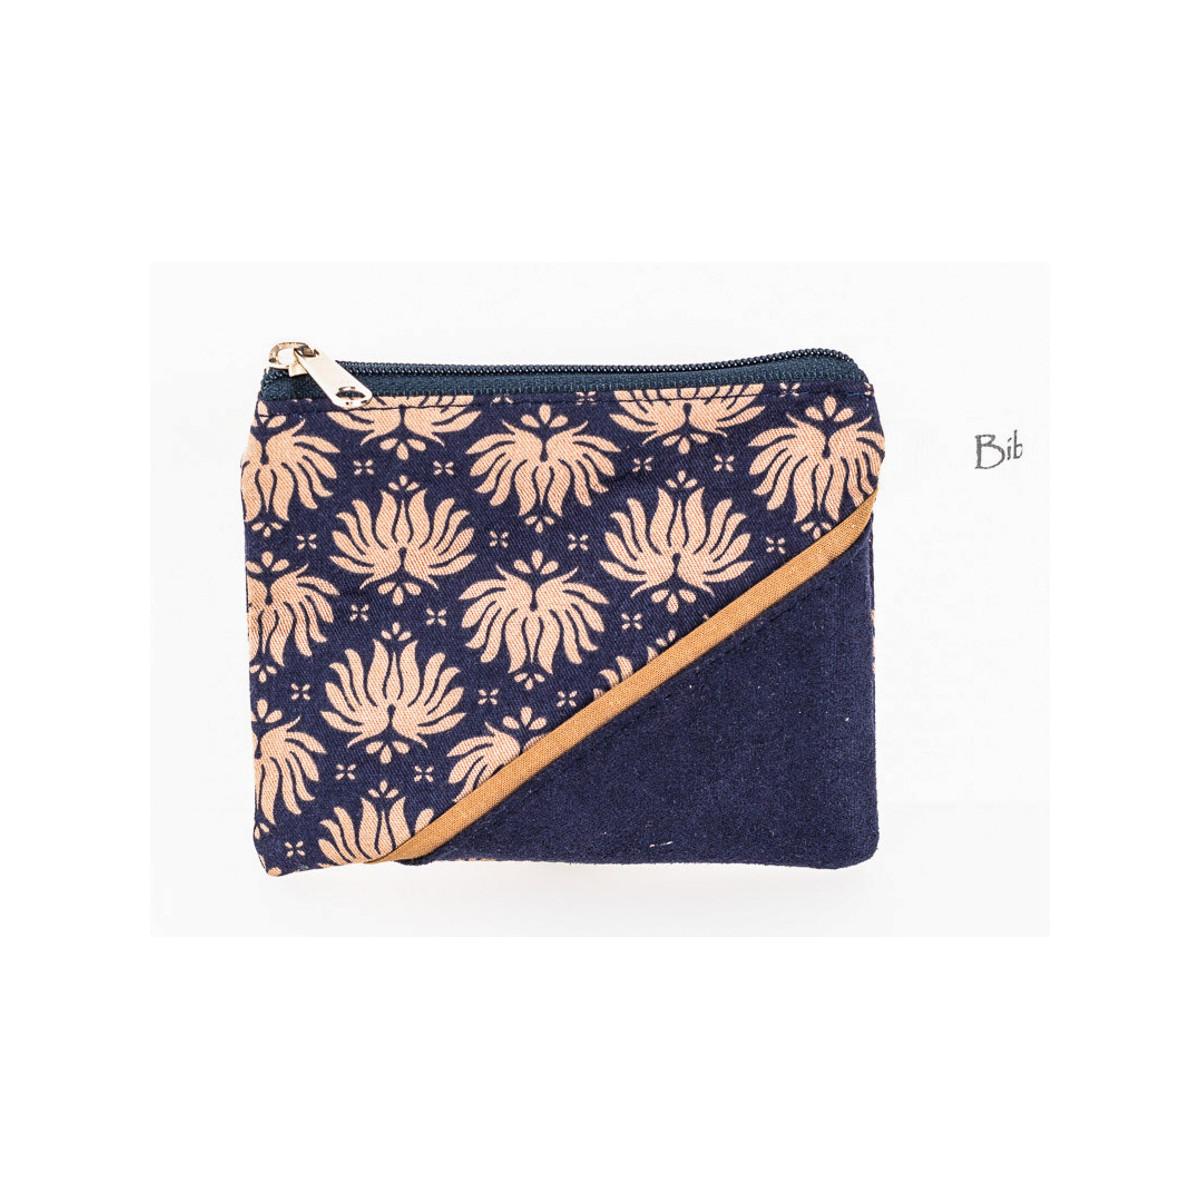 Petit porte-monnaie zippé bleu et écru